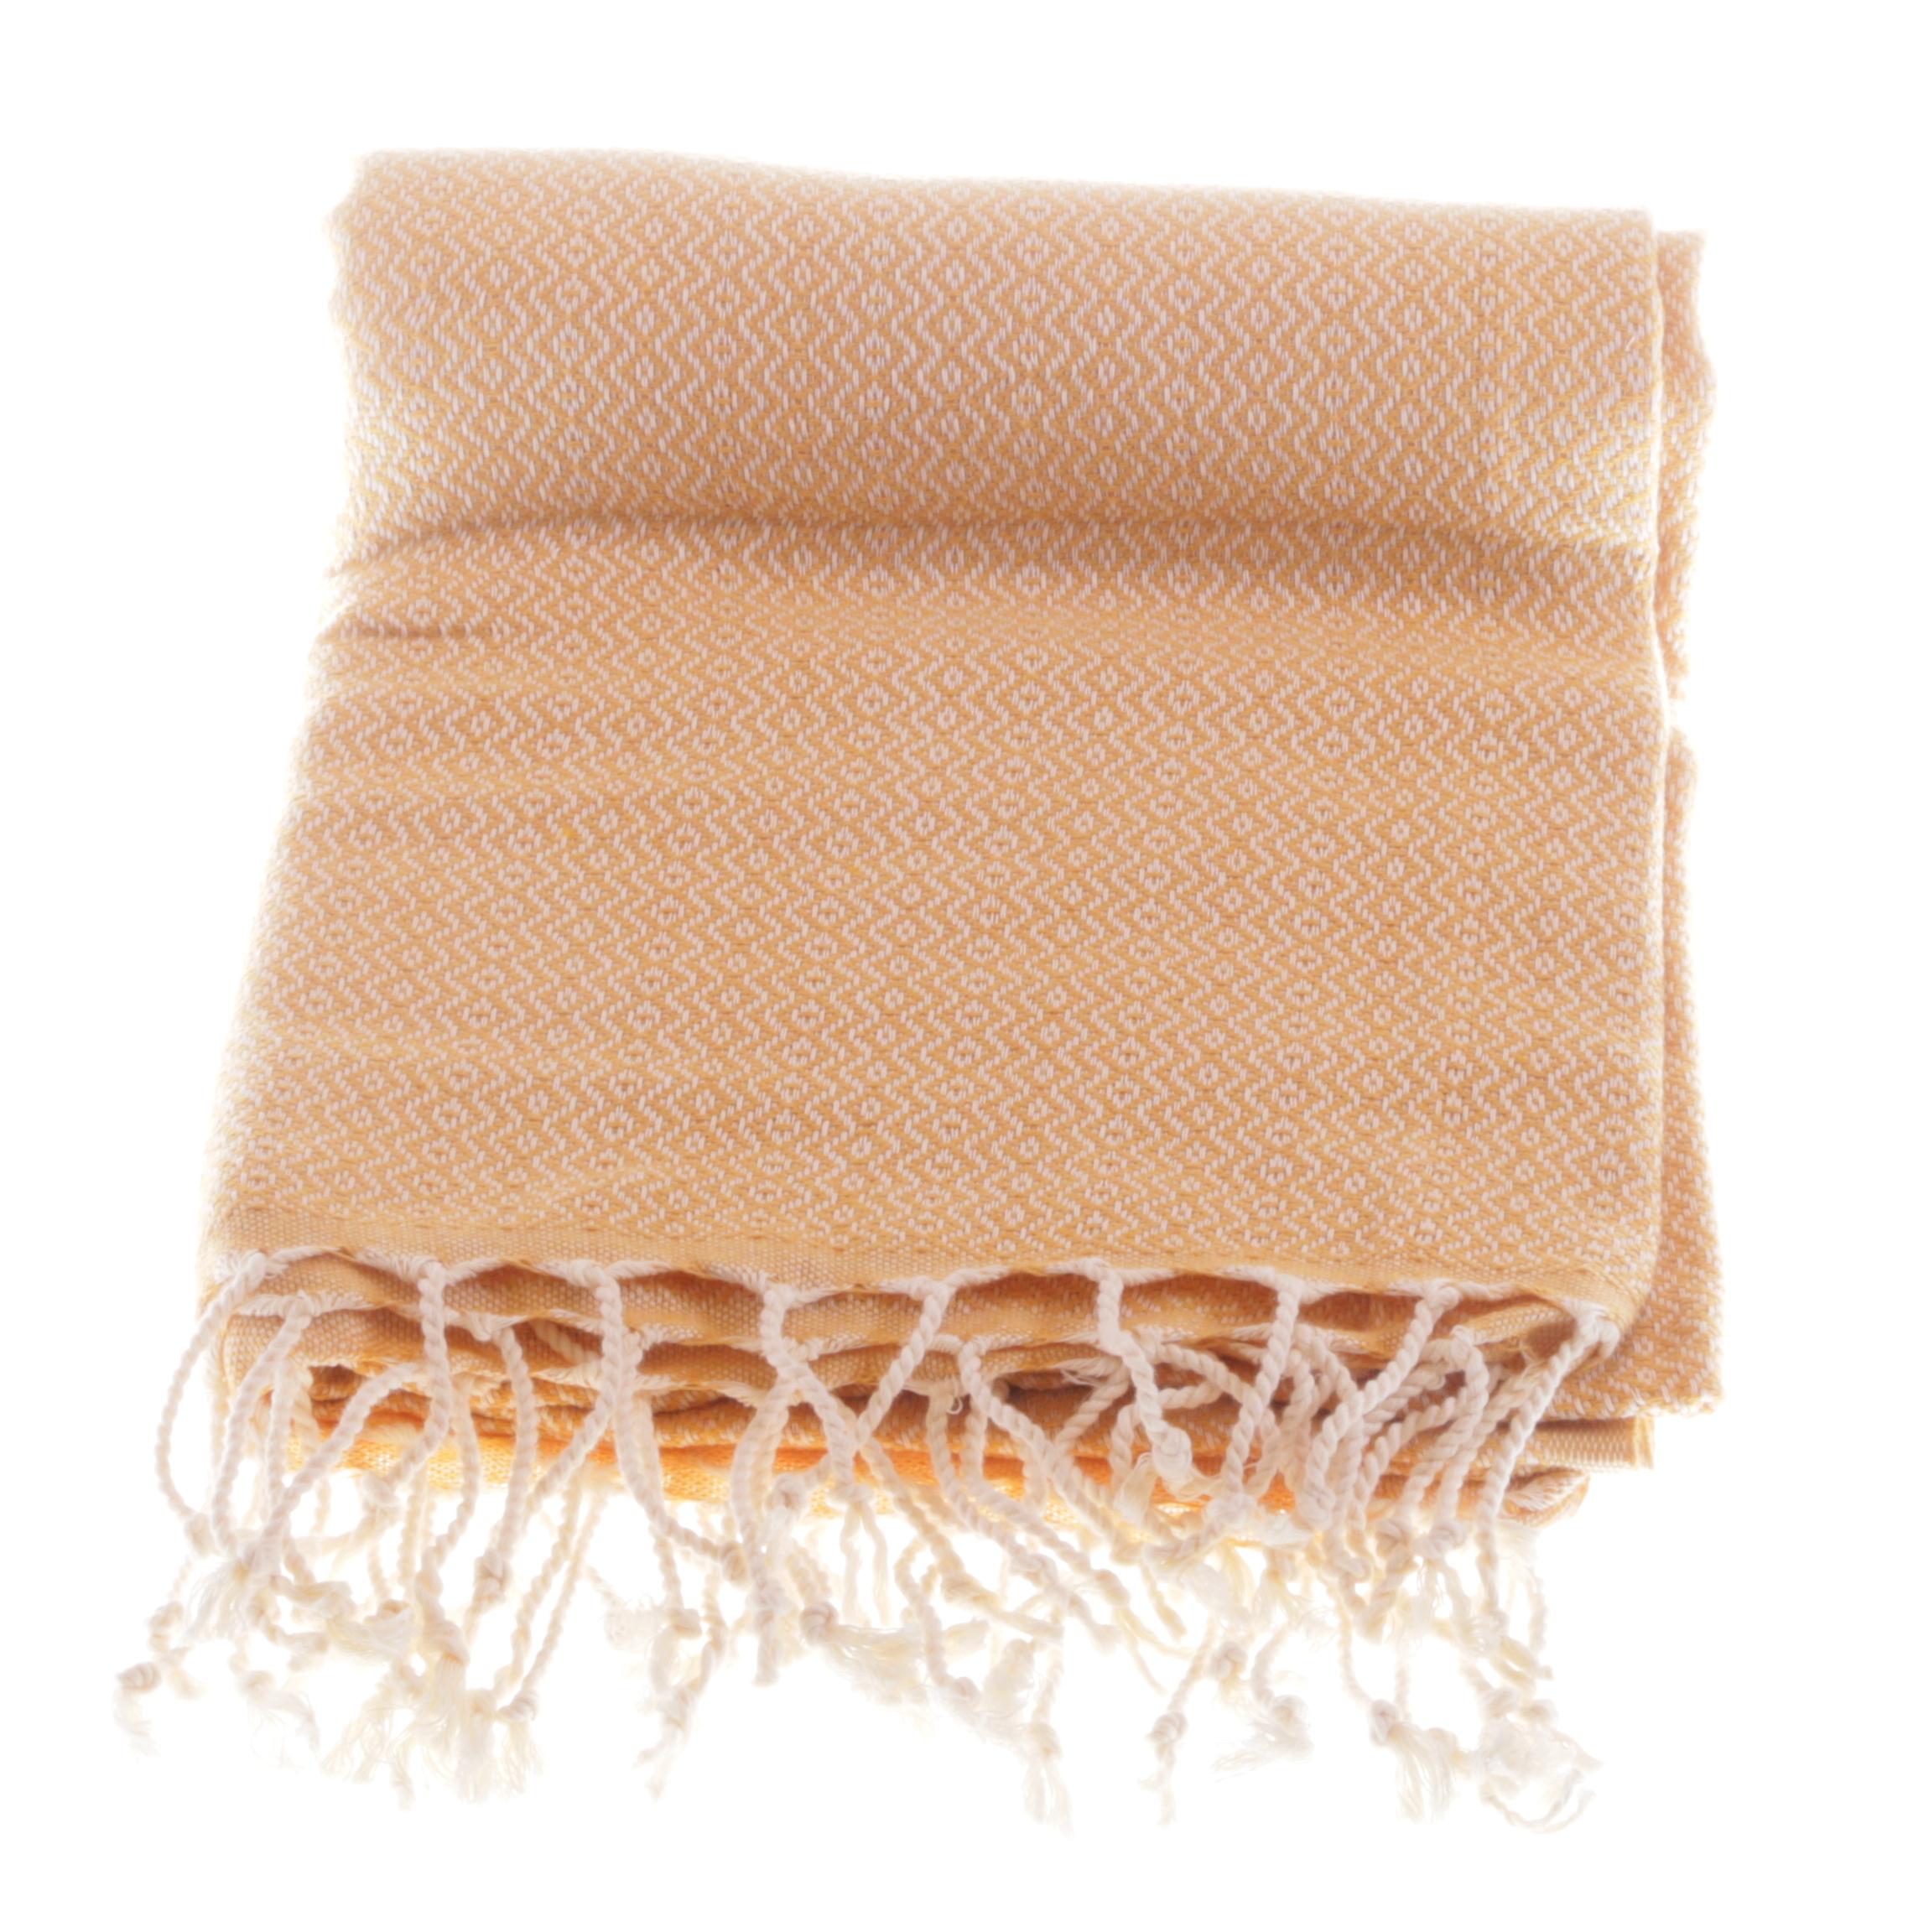 cotoon-hammam-towel-keli2-yellow